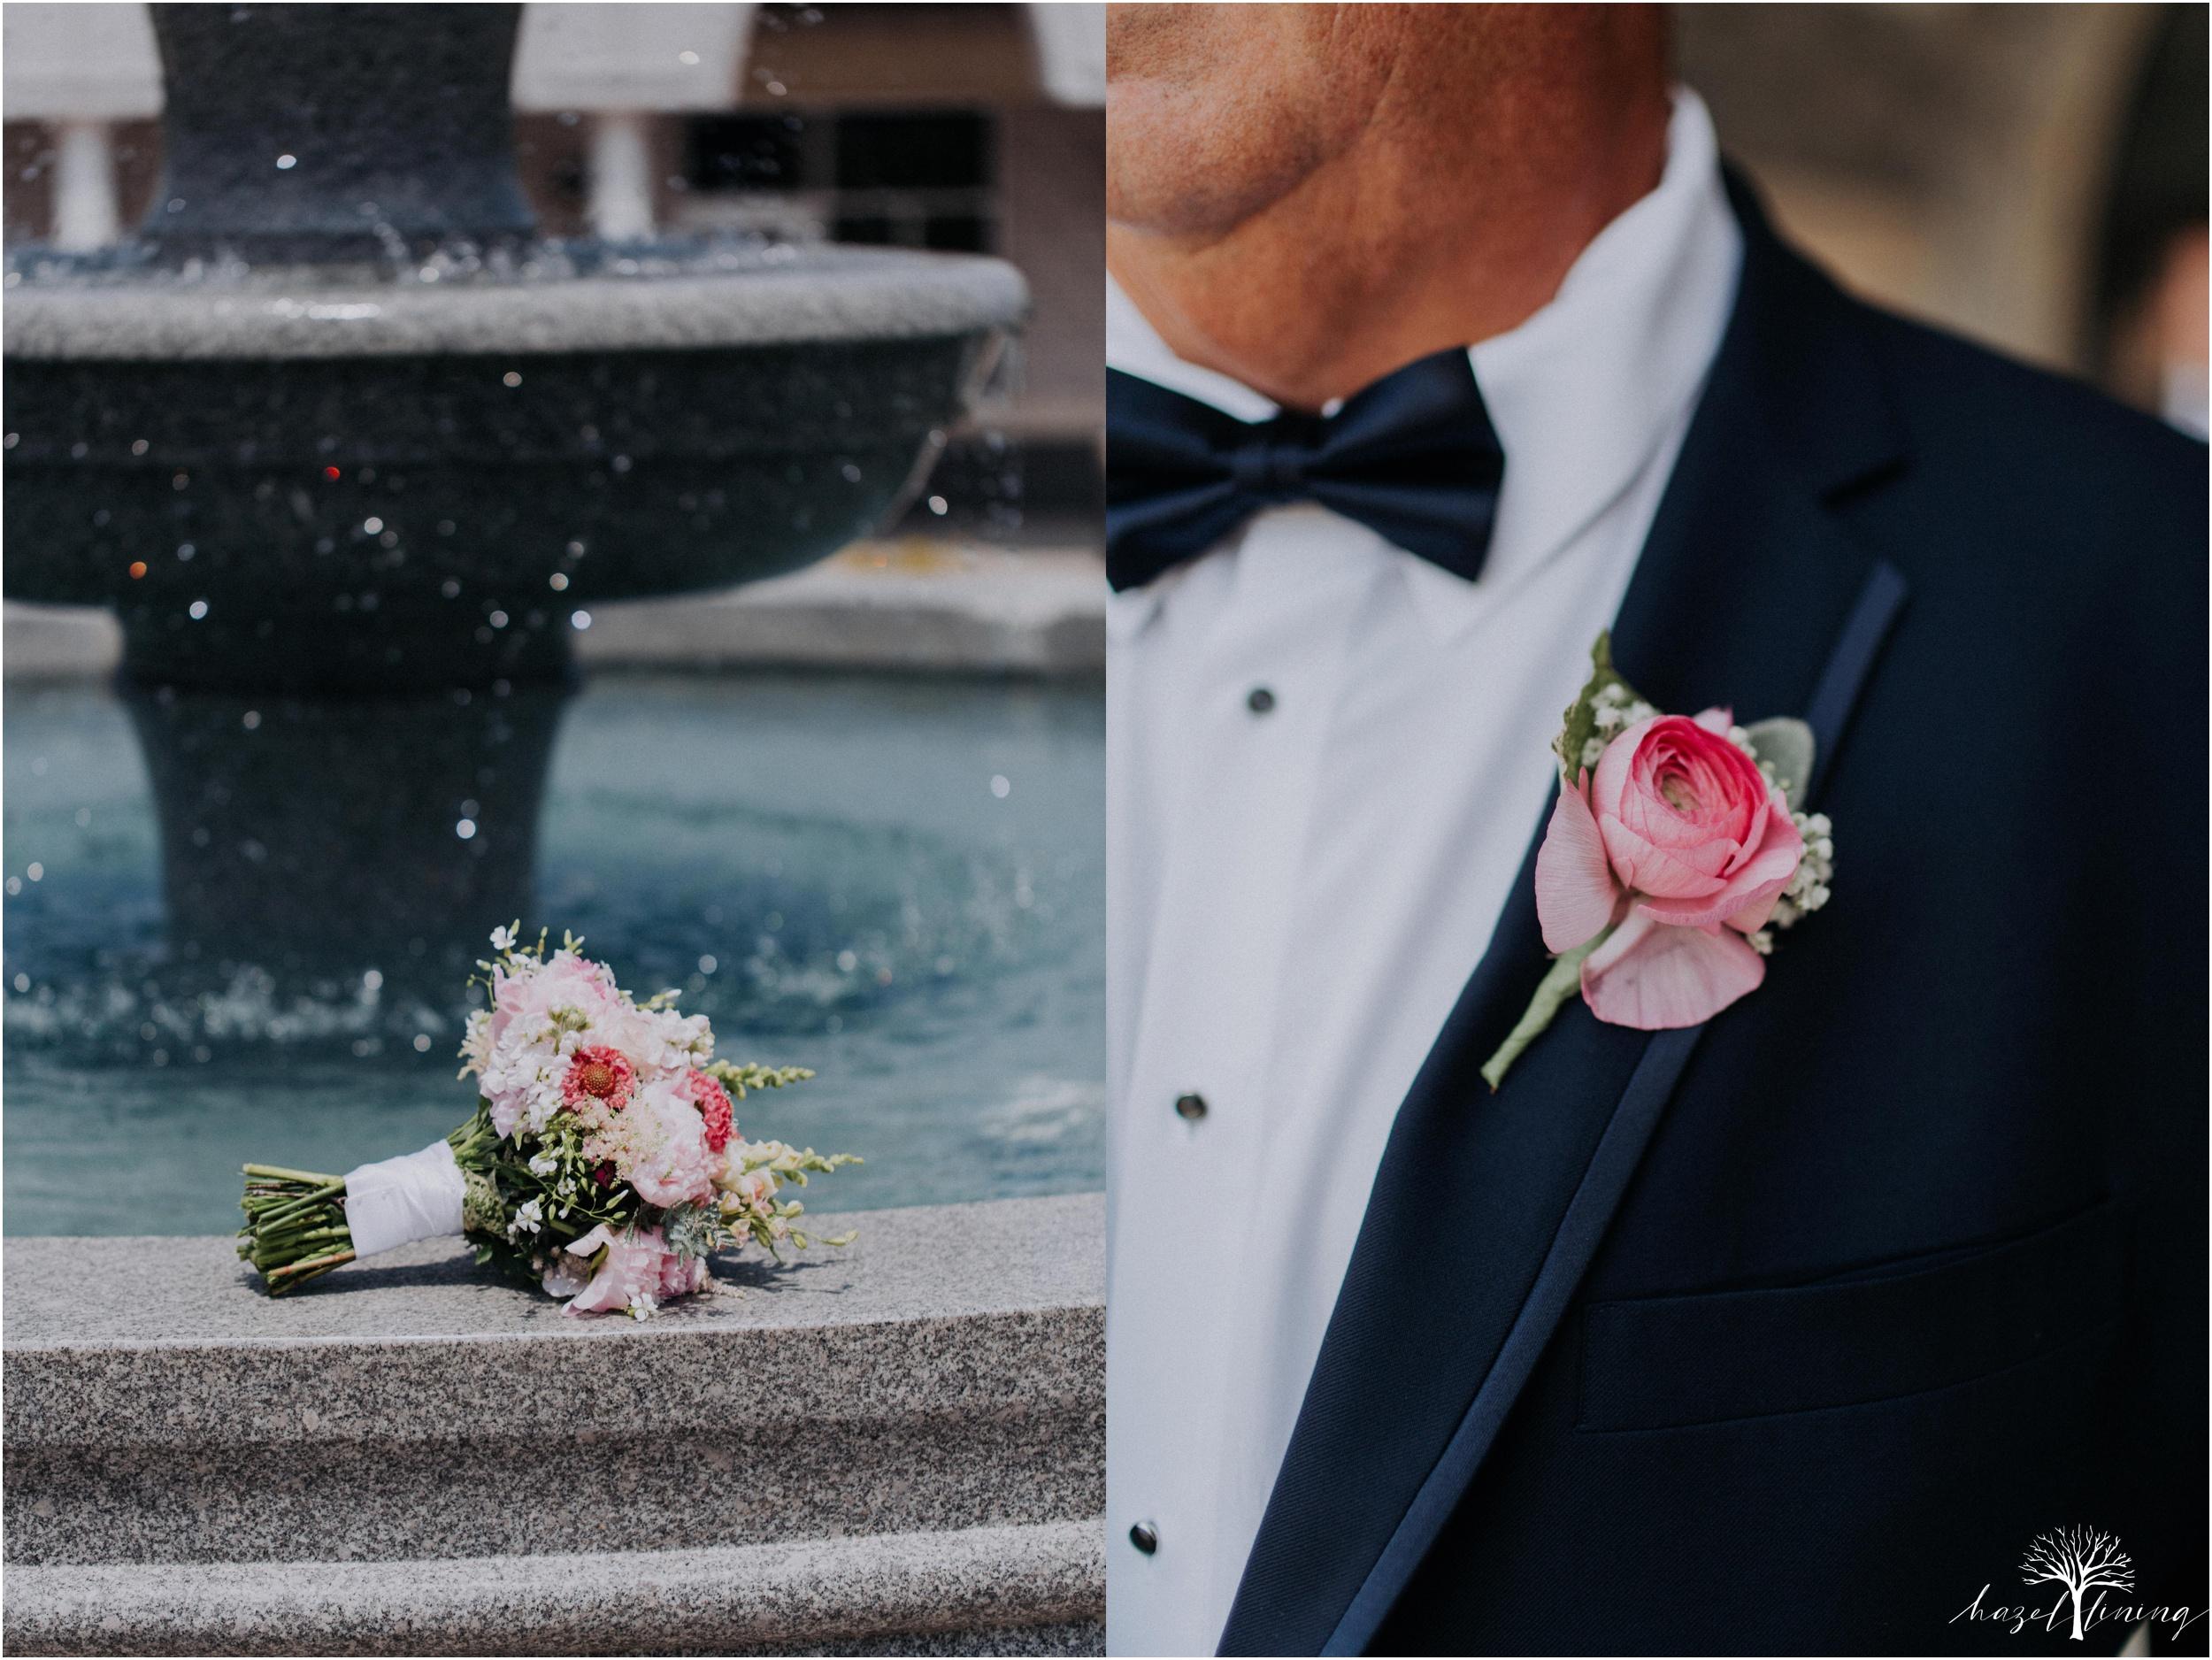 hazel-lining-travel-wedding-elopement-photography_0045.jpg